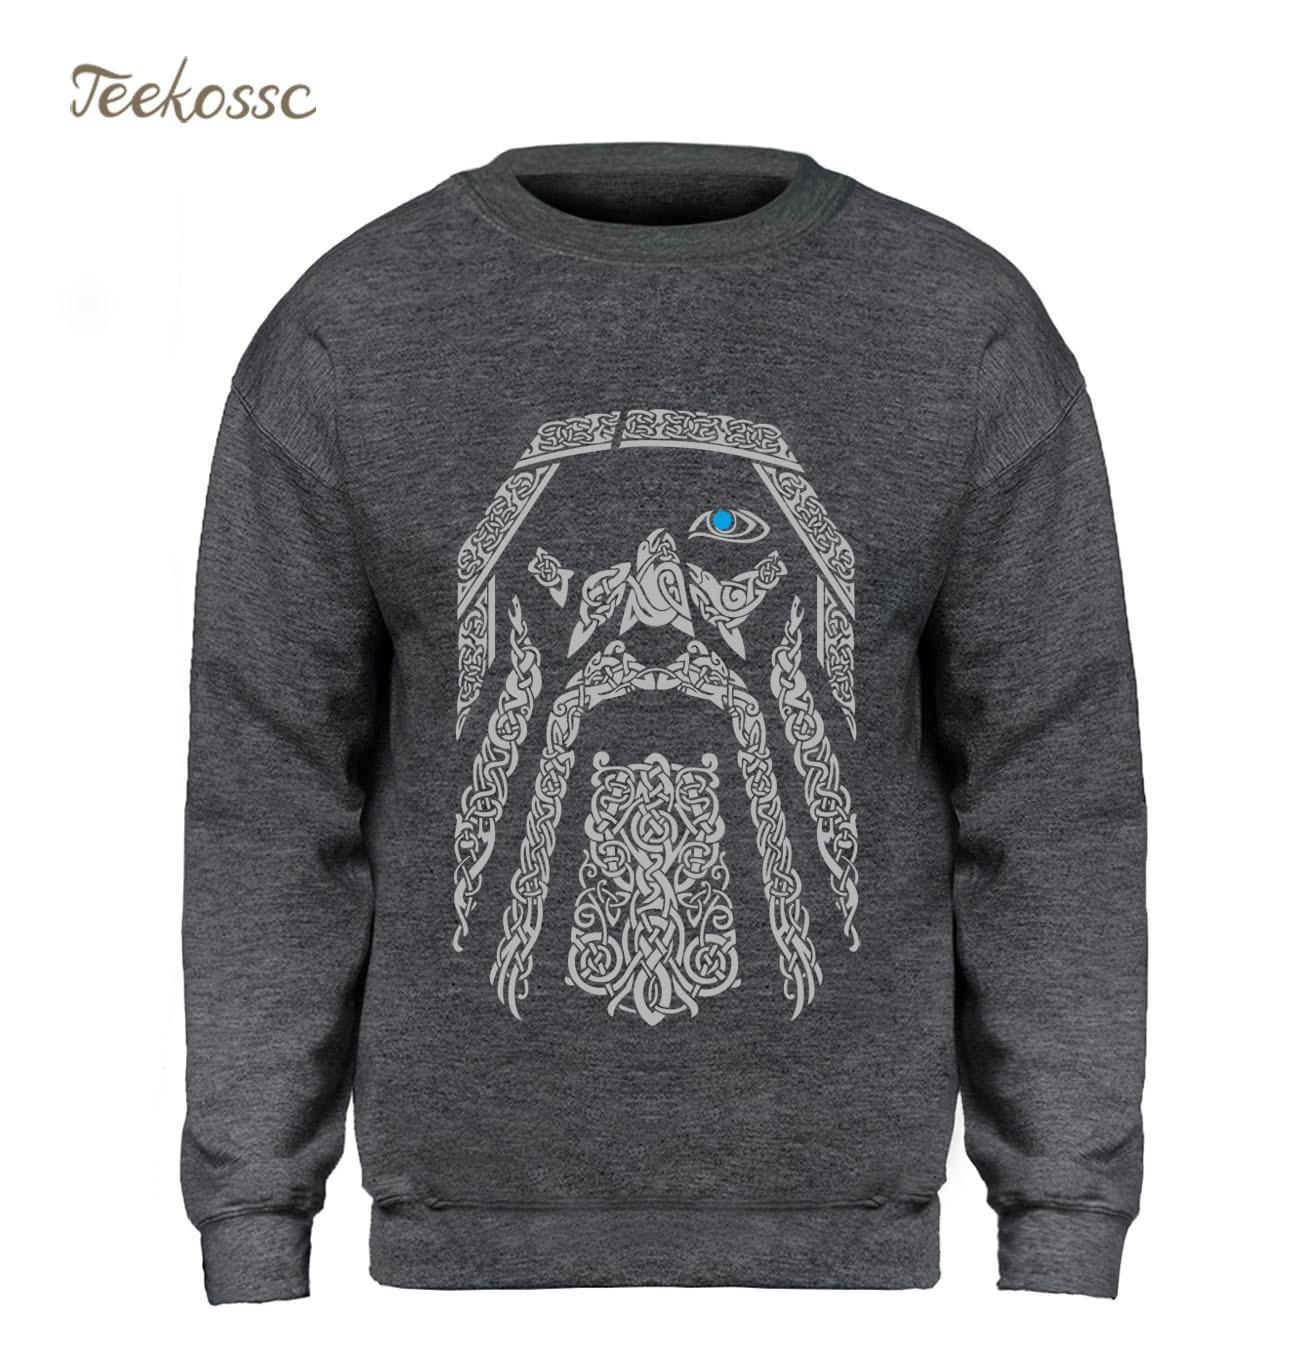 Odin Vikings Vintage Hoodie Men Sweatshirt Crewneck Sweatshirts 2018 Winter Autumn Fleece Warm Father's Day Gifts Pullover Coat